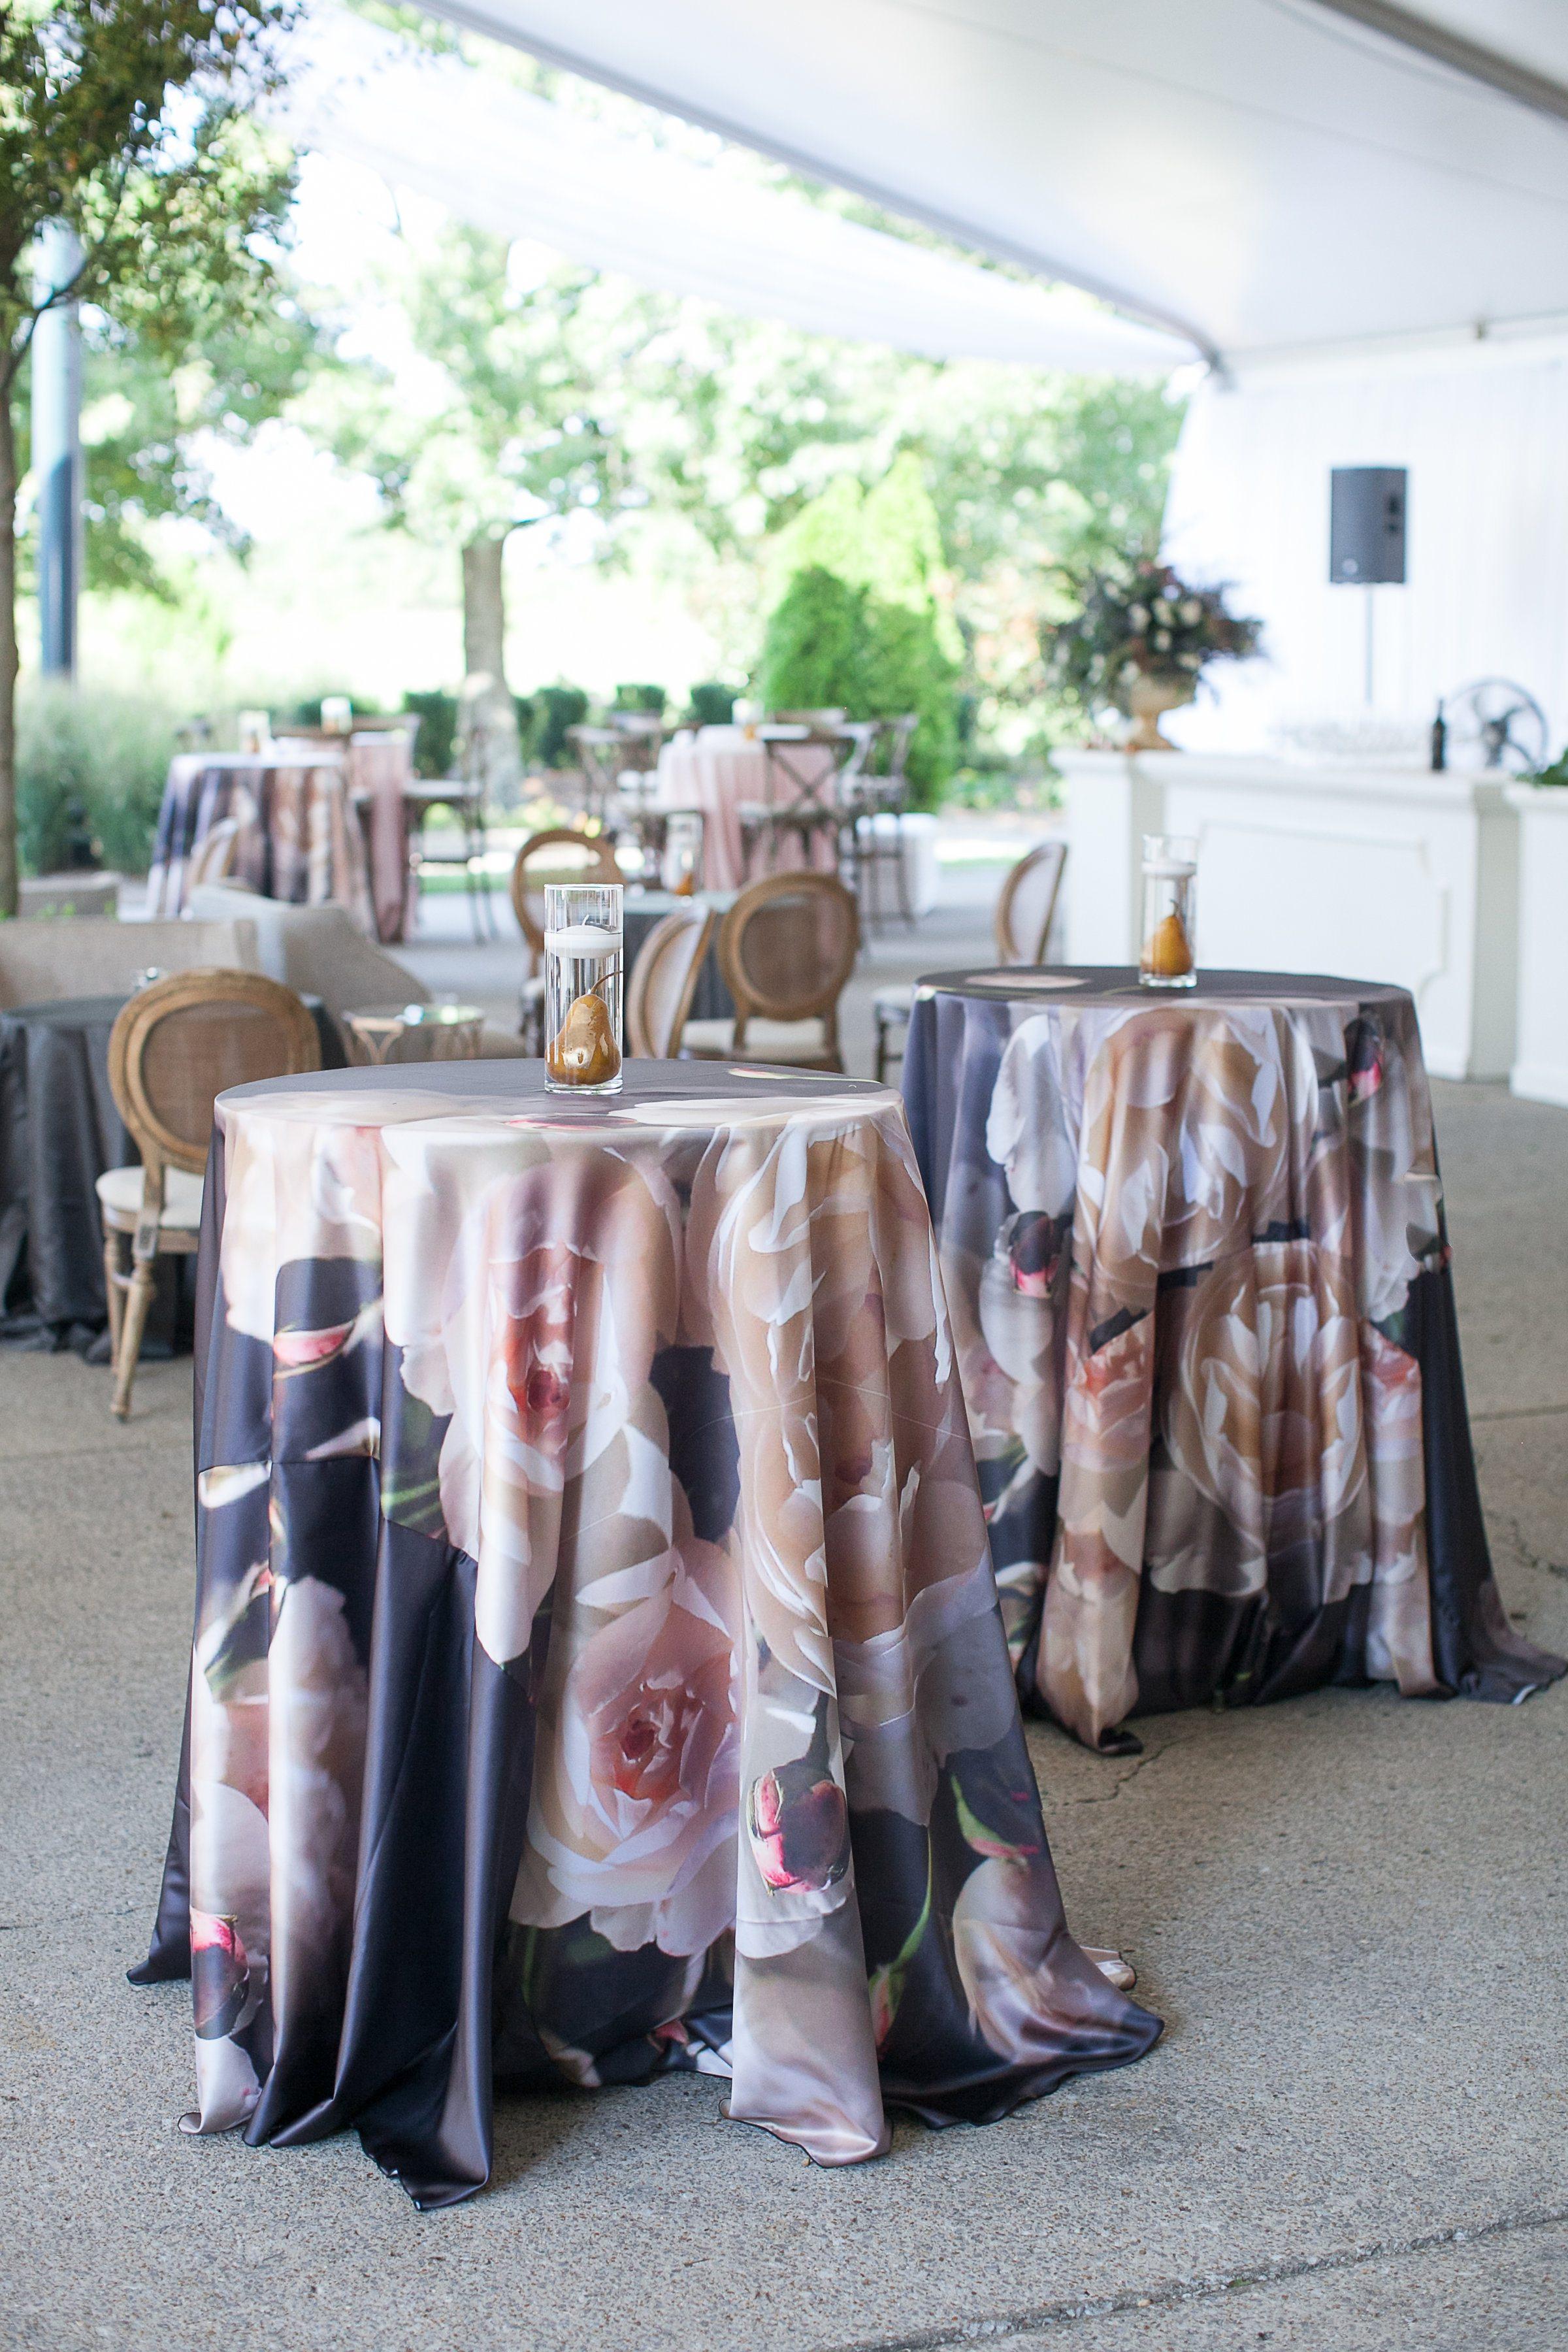 Discount Table Linen Rentals Part - 22: Photo Credit: Phindy Studios